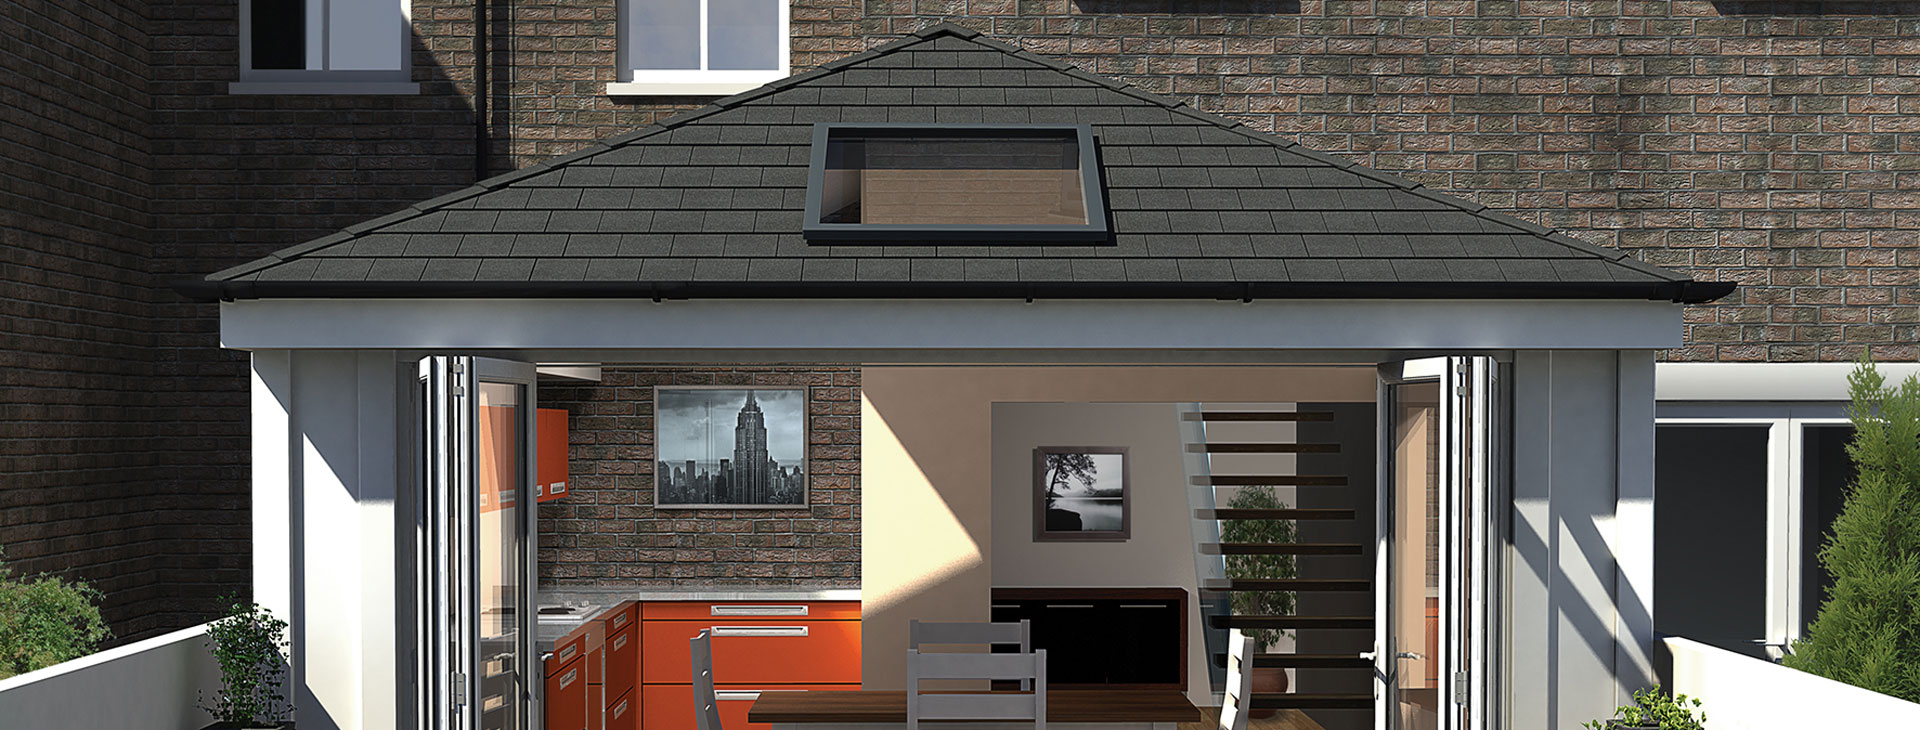 loggia-ultimate-london-house-1920x730